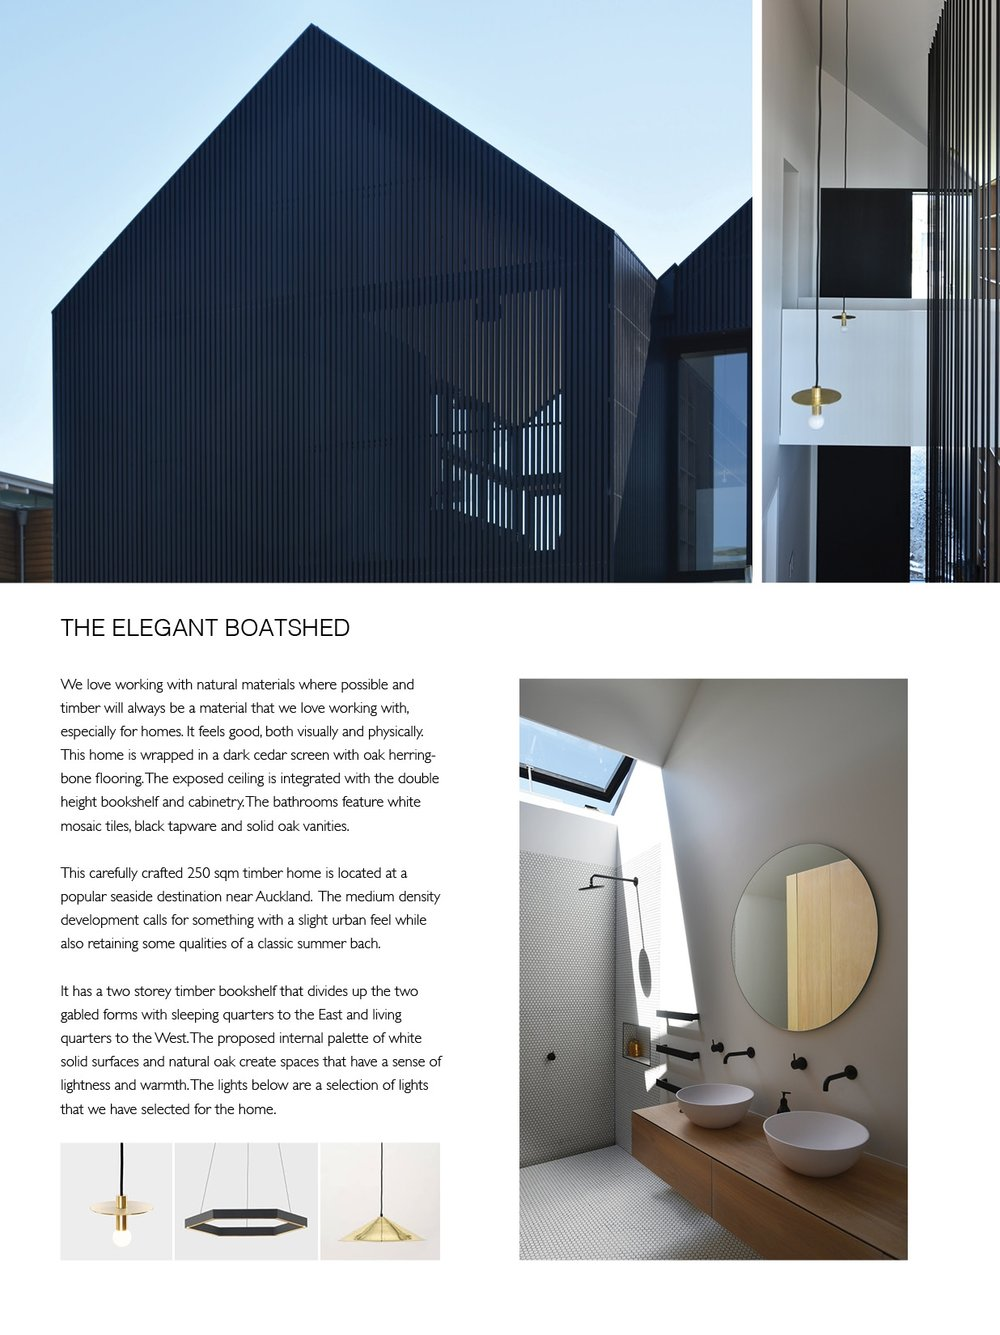 Atelier Aitken Elegant boatshed home